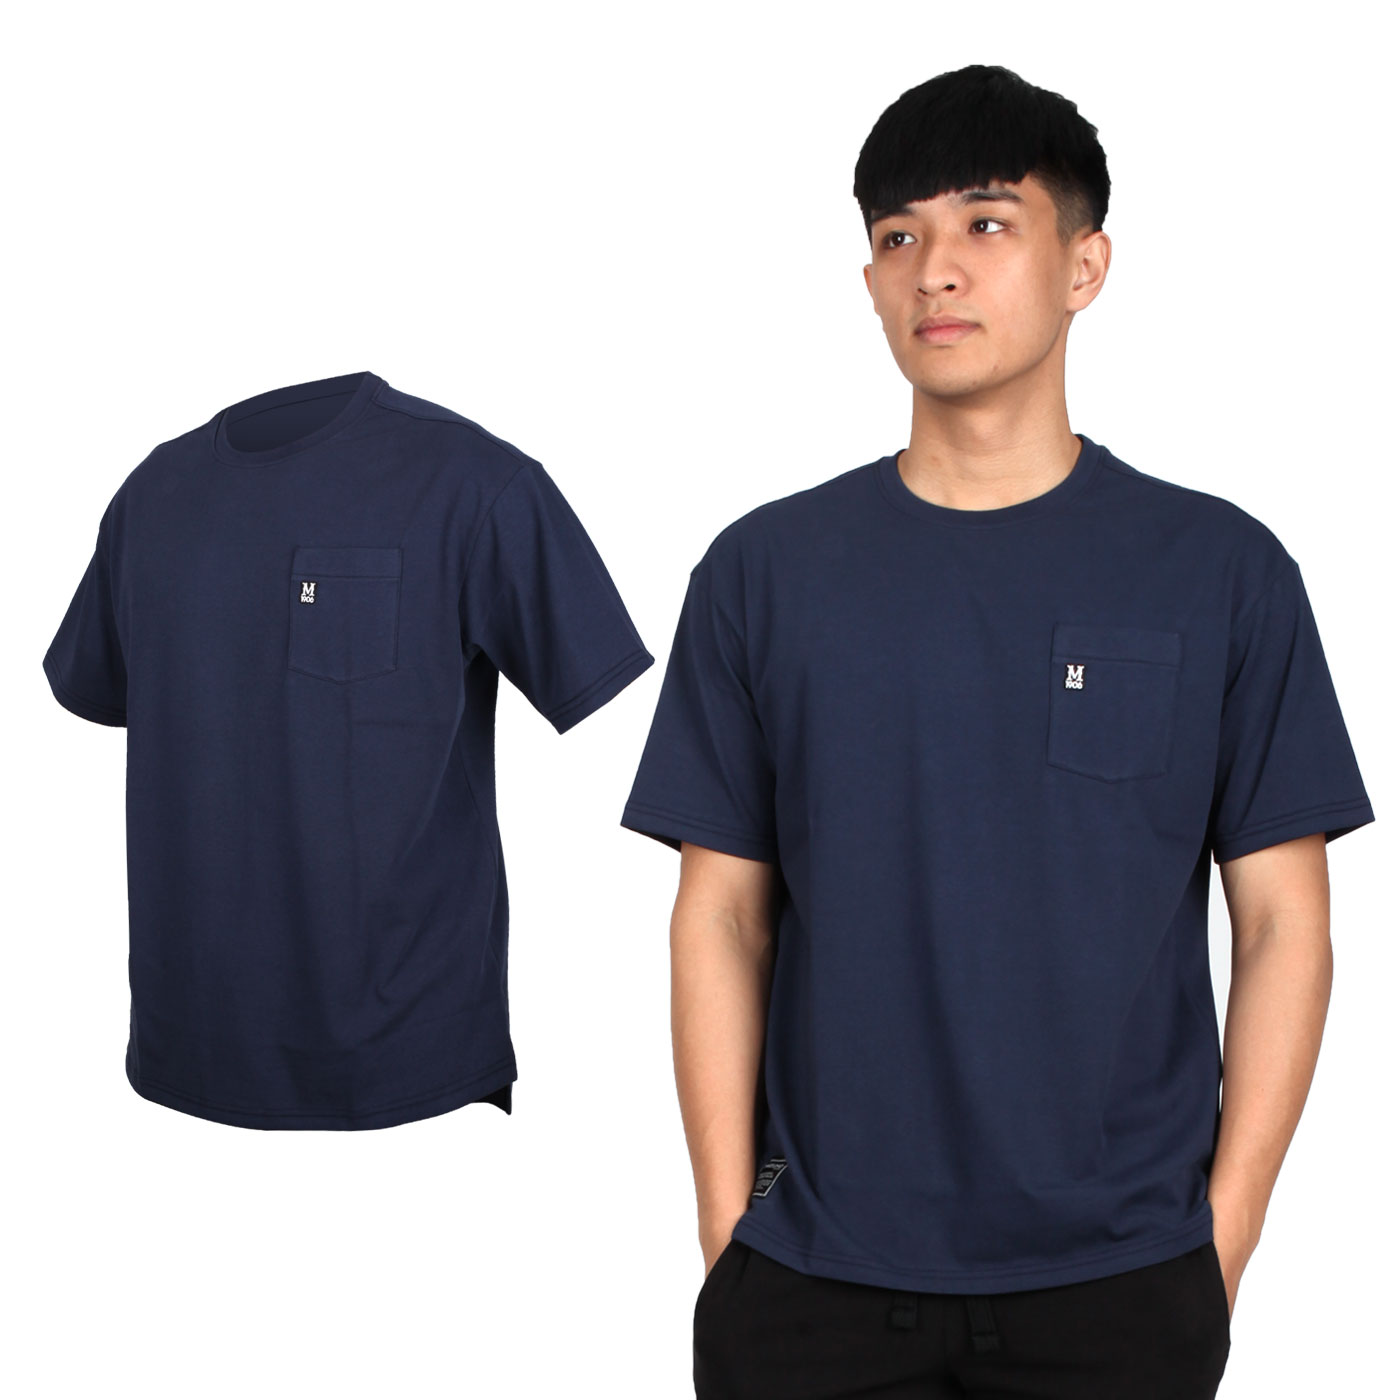 MIZUNO 男款1906系列短袖T恤 D2TA000101 - 丈青黑白